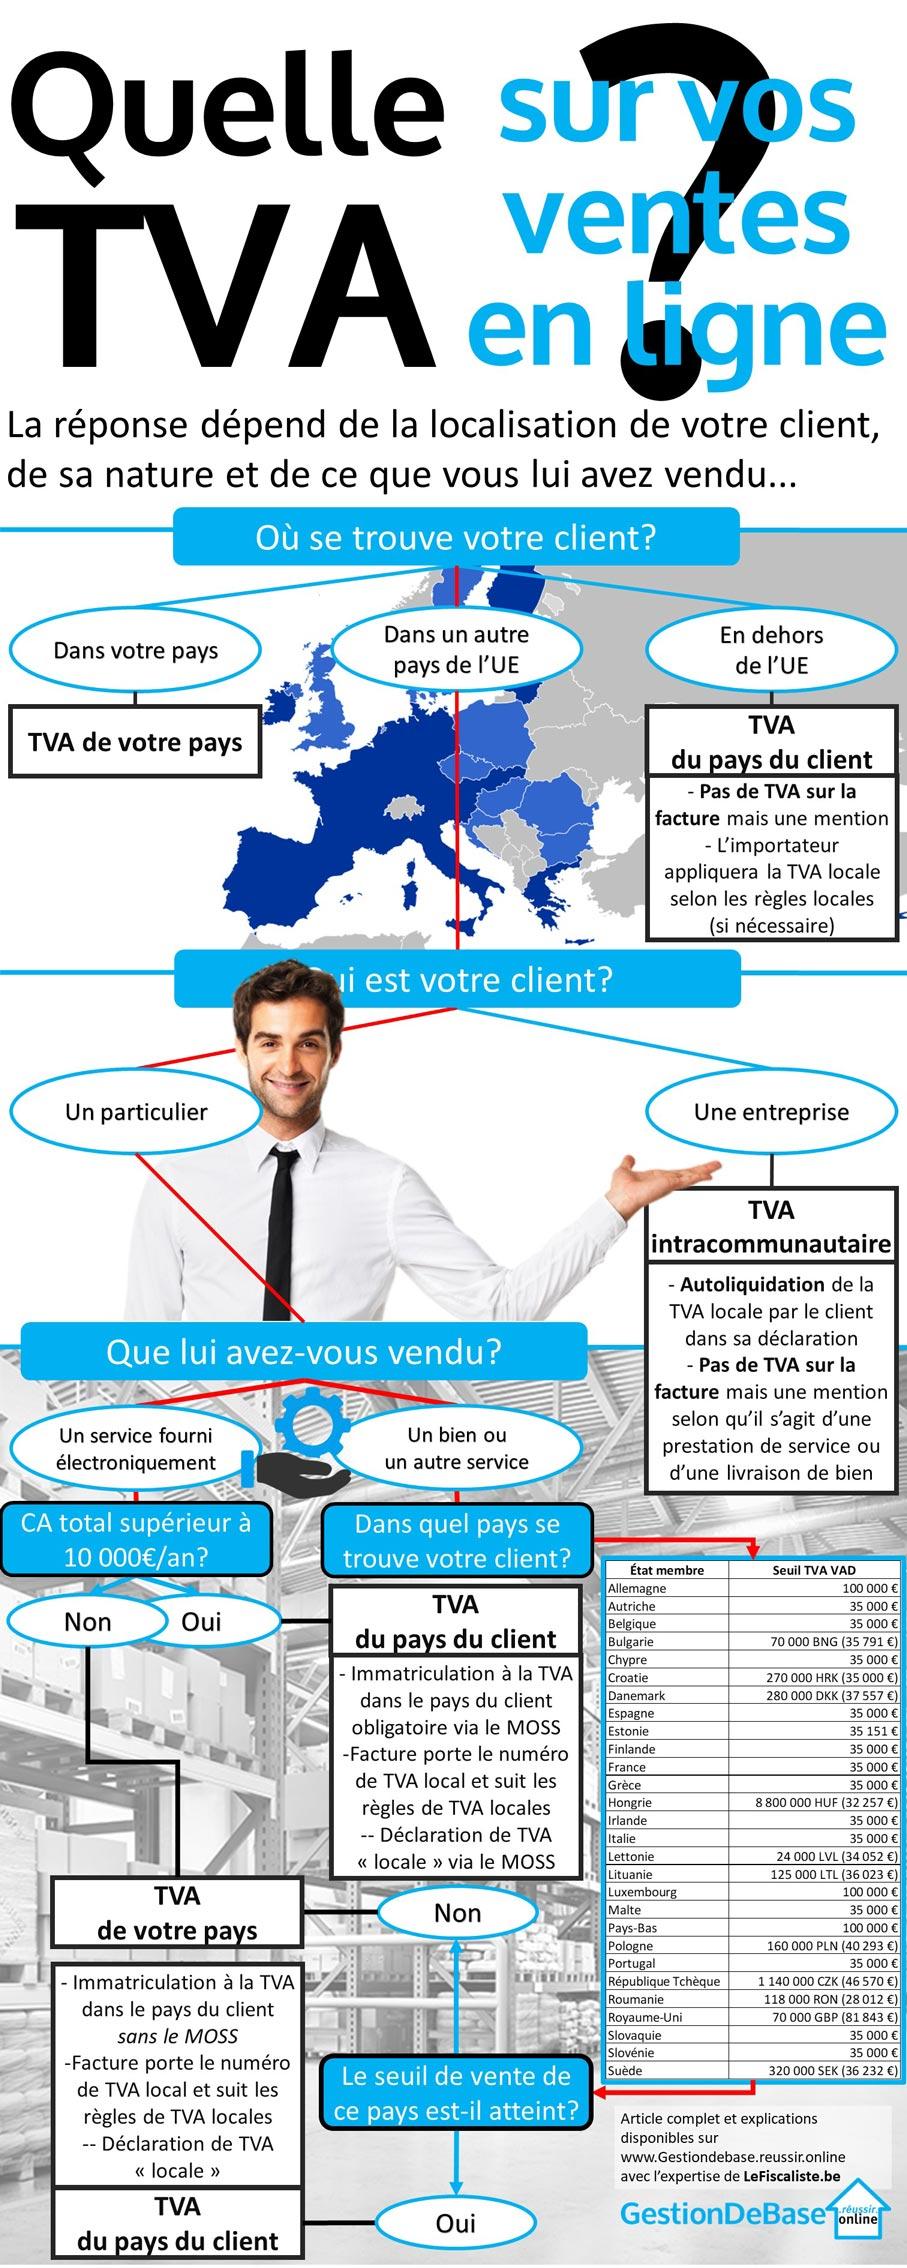 Infographie TVA Ventes en ligne